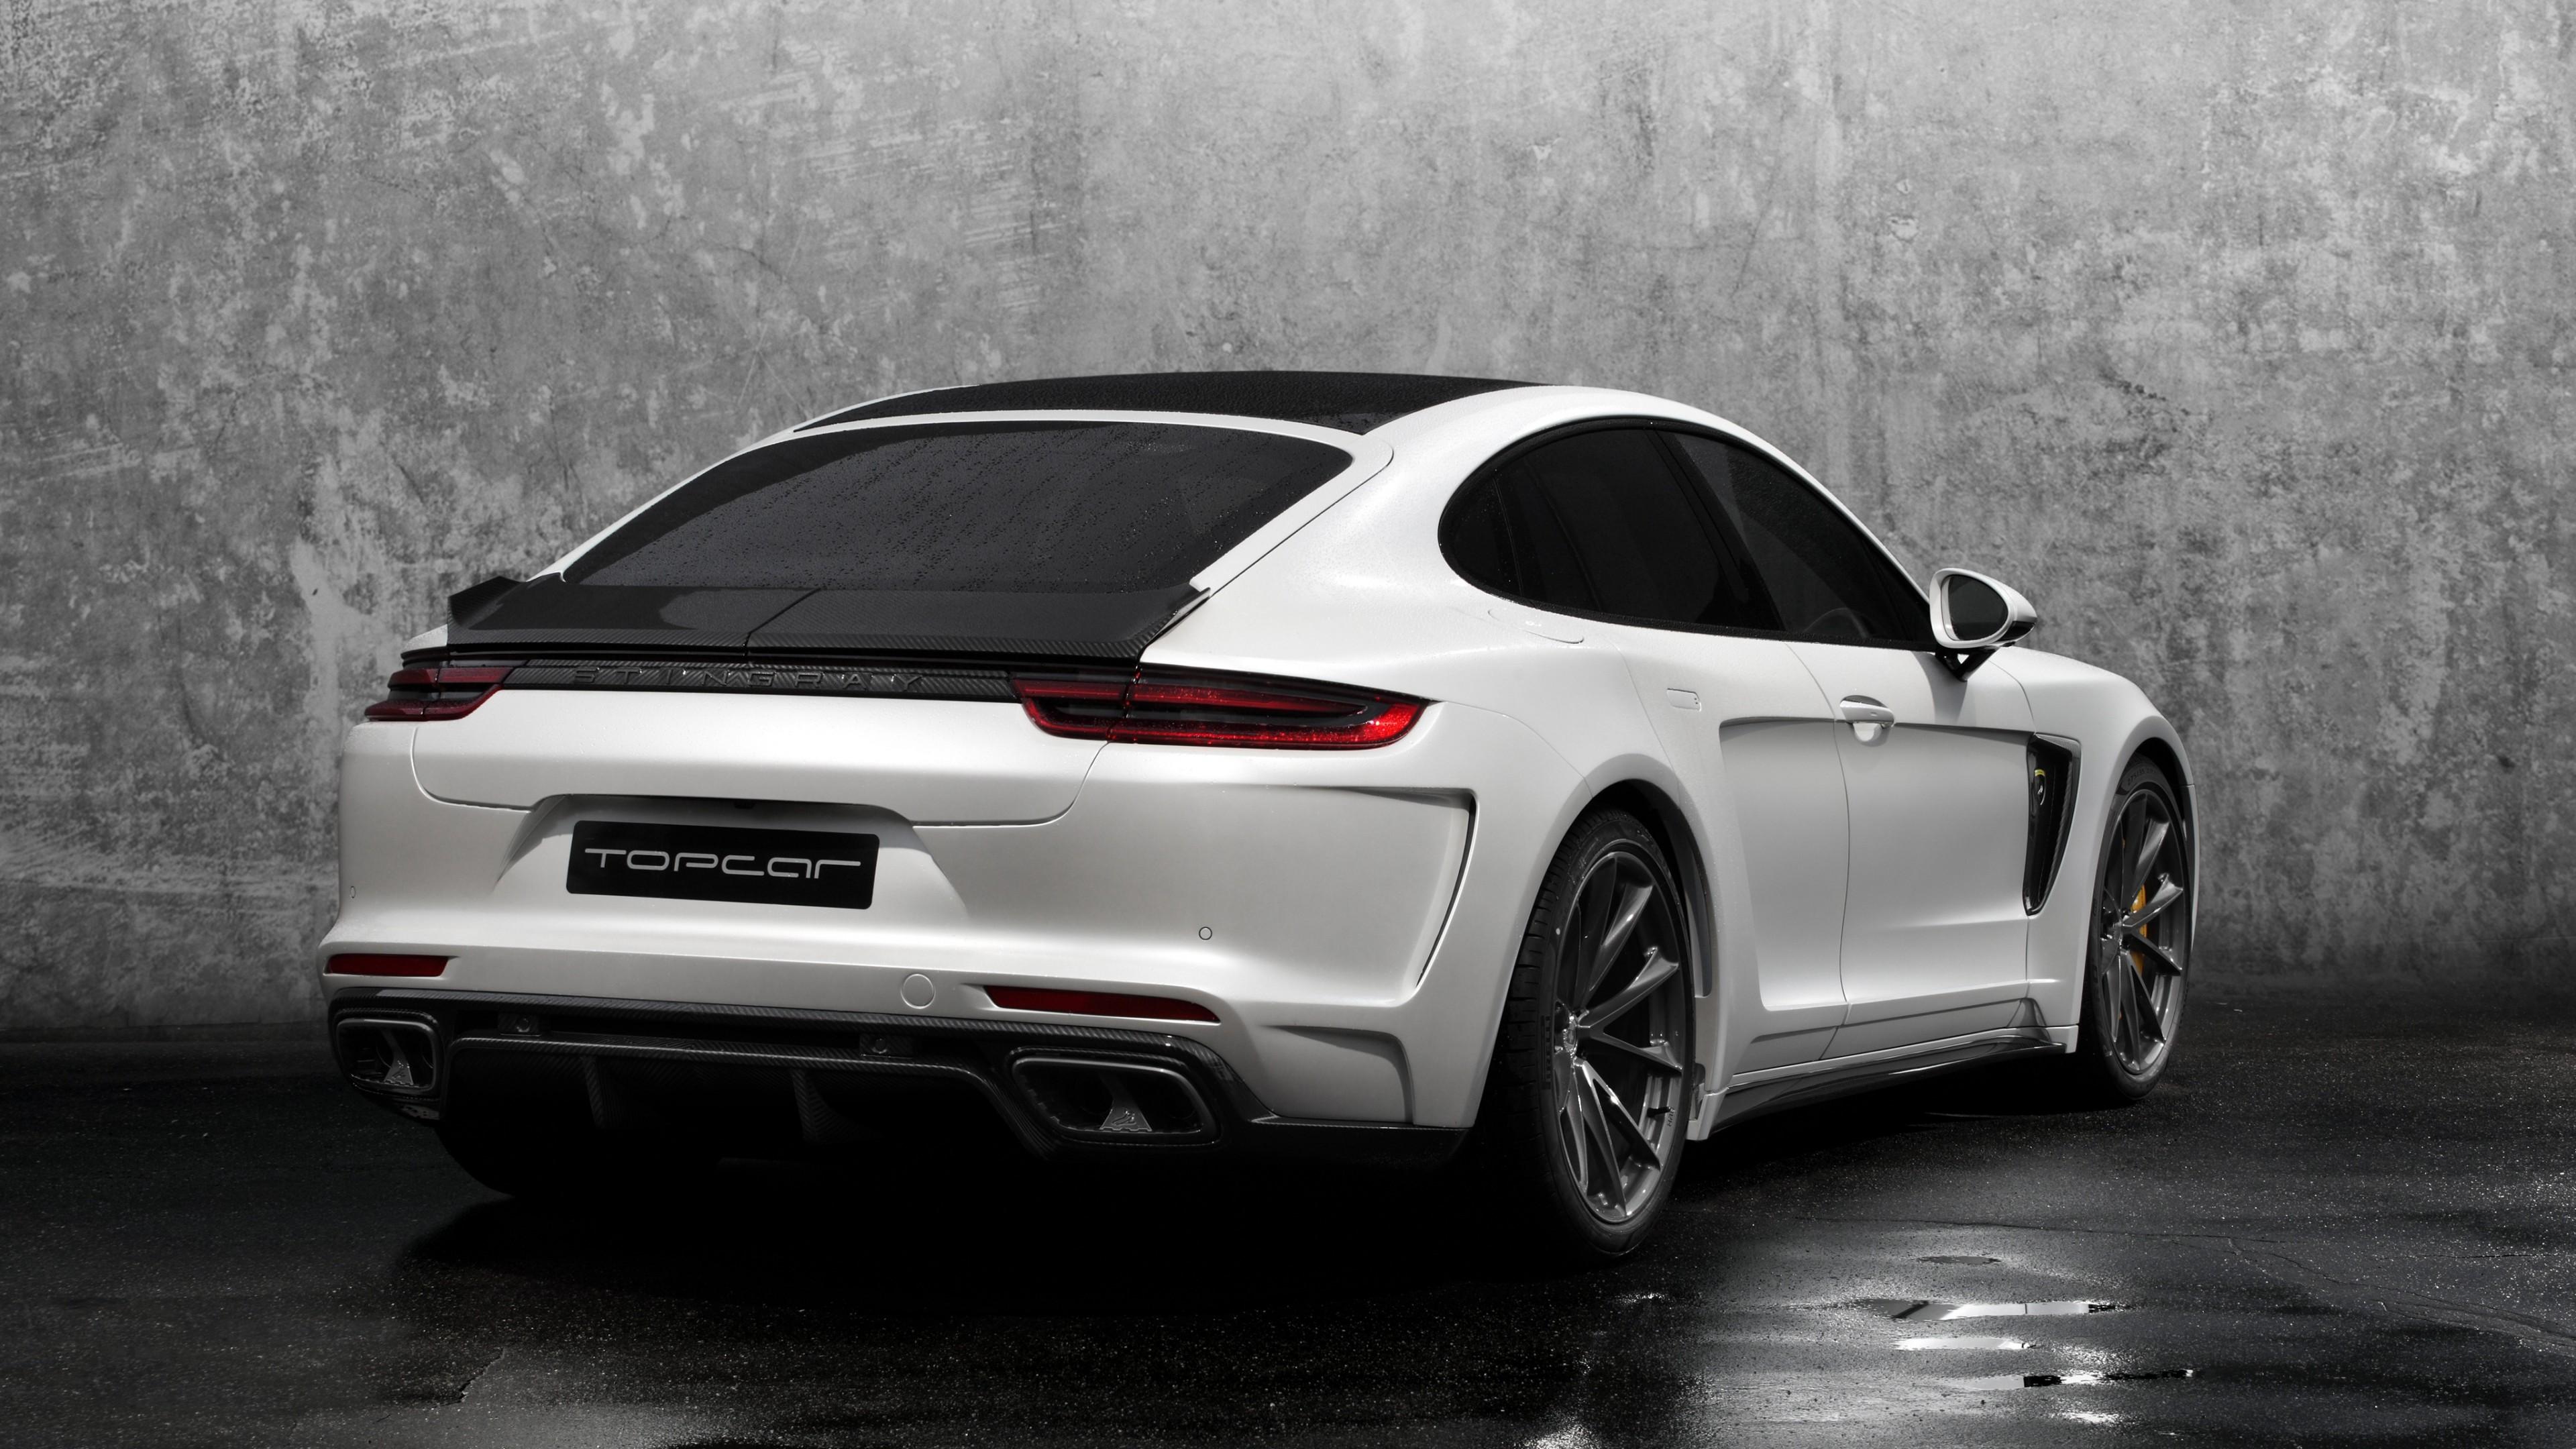 Carbon Wallpaper Iphone X 2017 Topcar Porsche Panamera Stingray Gtr 2 Wallpaper Hd